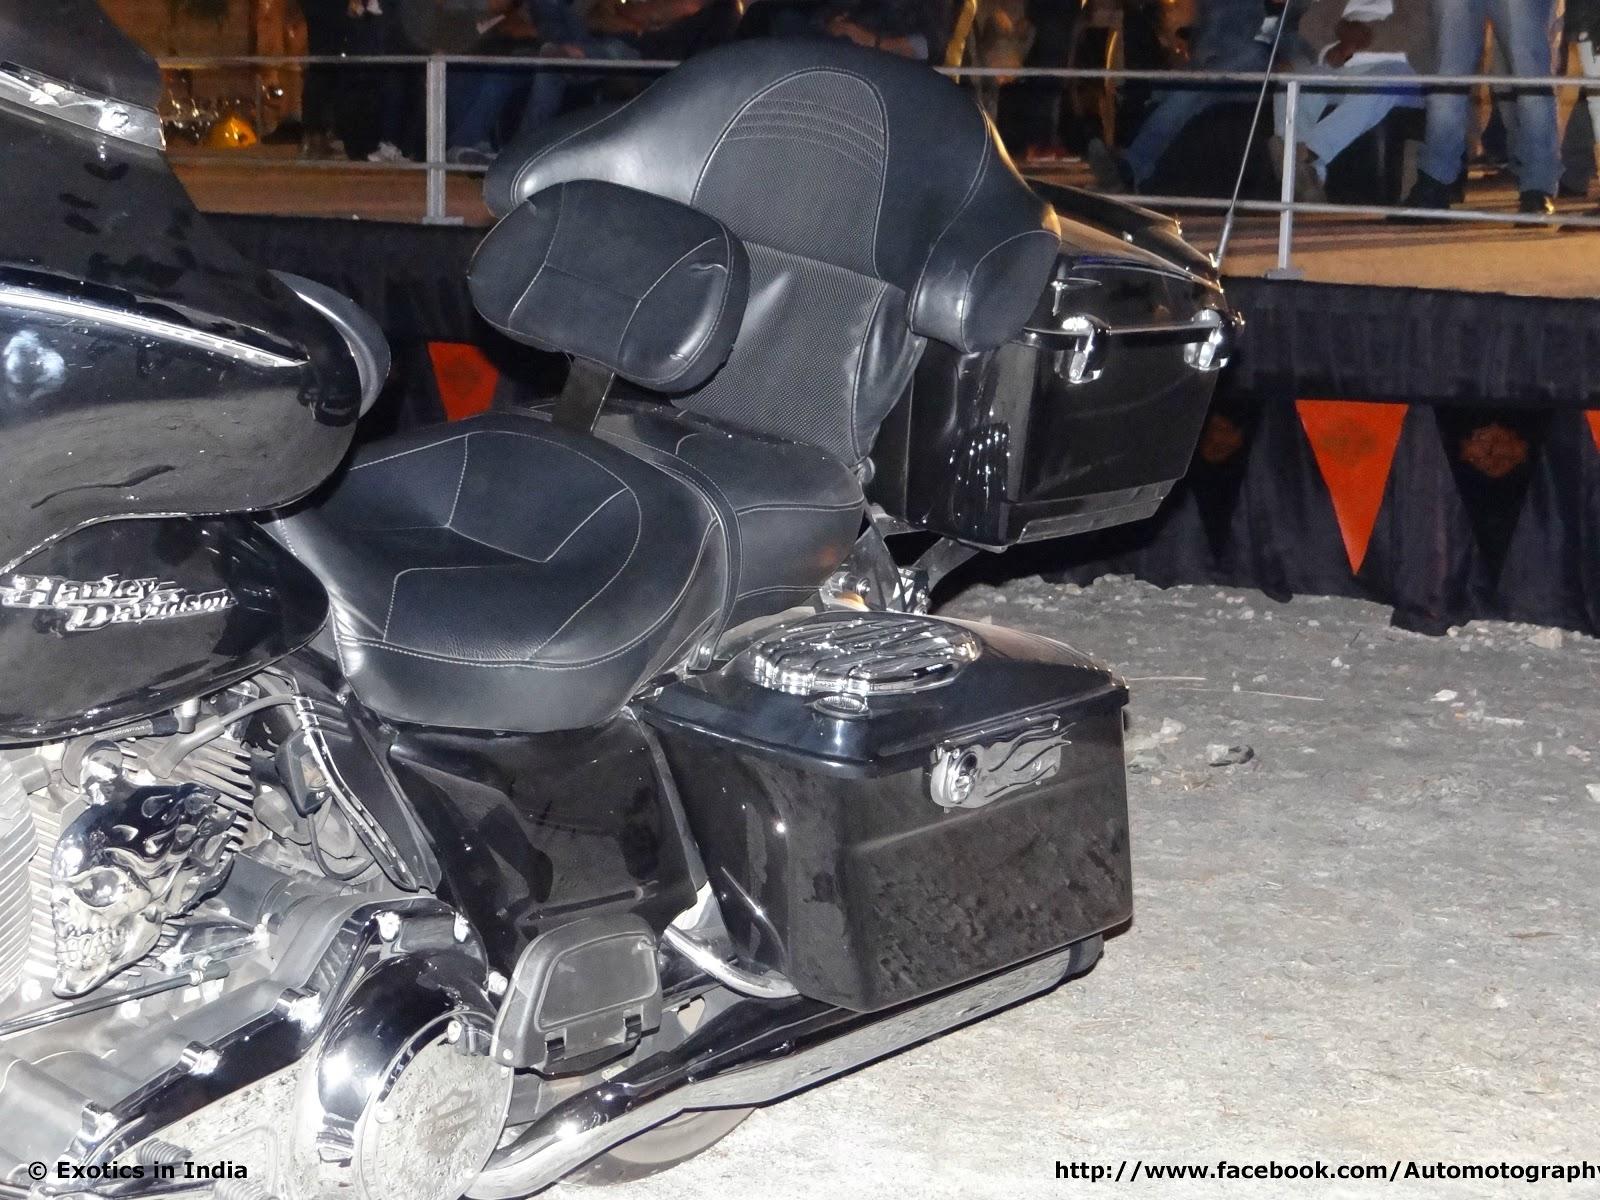 Harley Davidson Milestone Functional Jacket Stuttgart